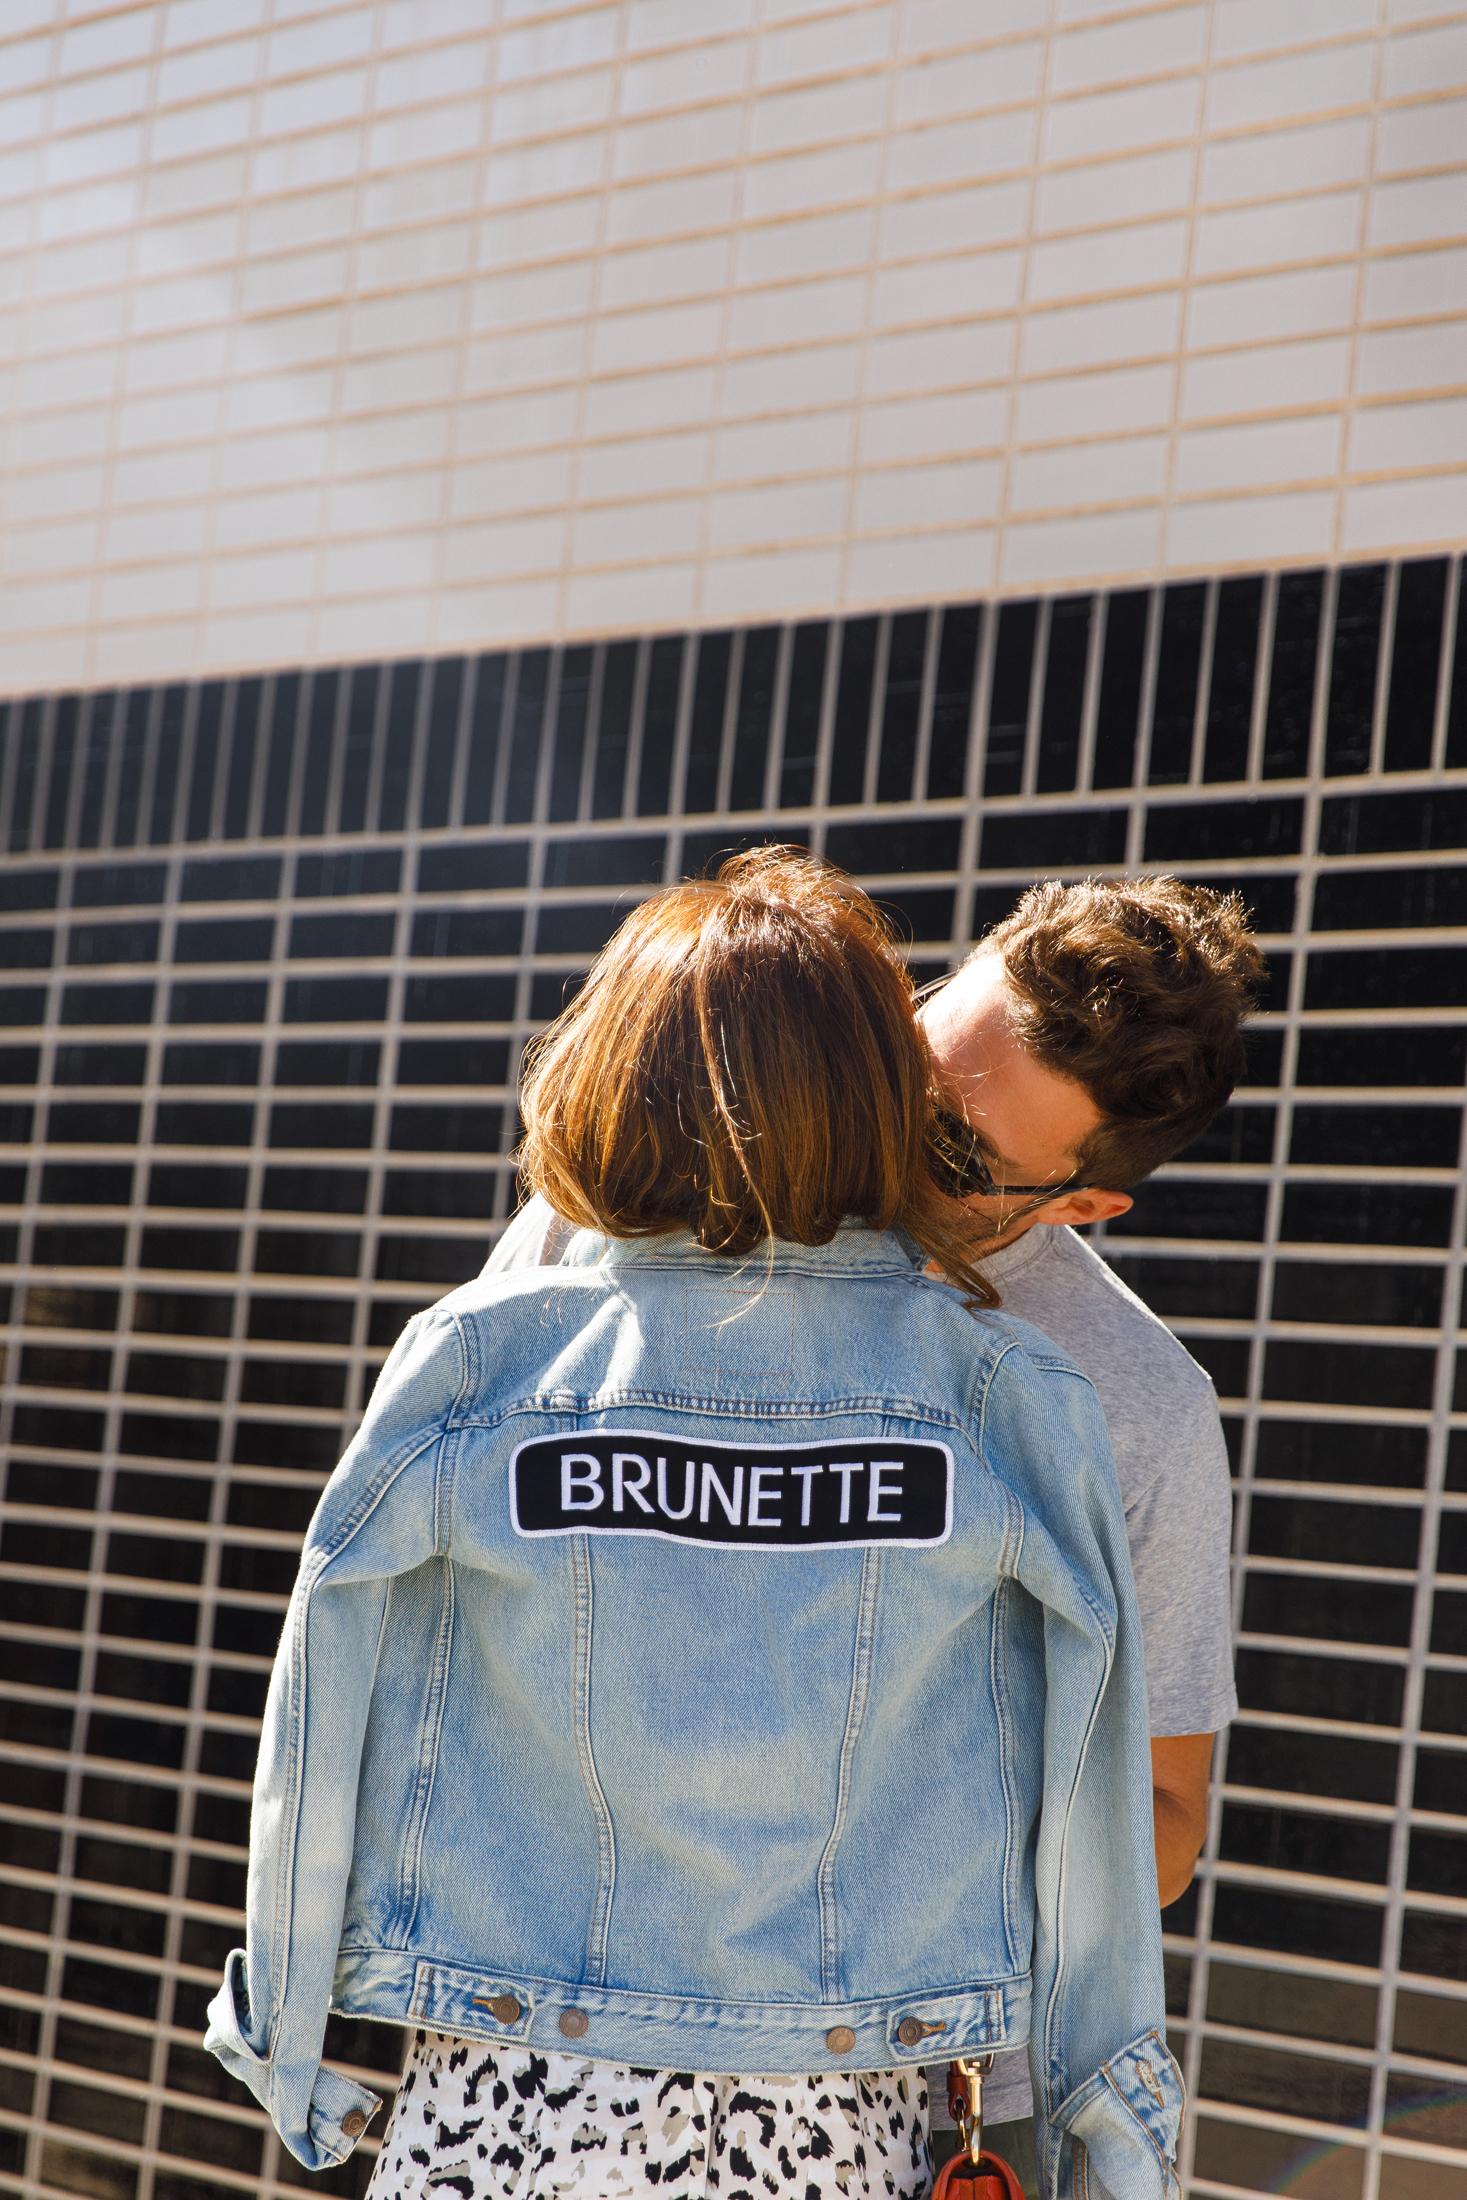 brunette the label, the best denim jacket, patched jackets, everyday pursuits